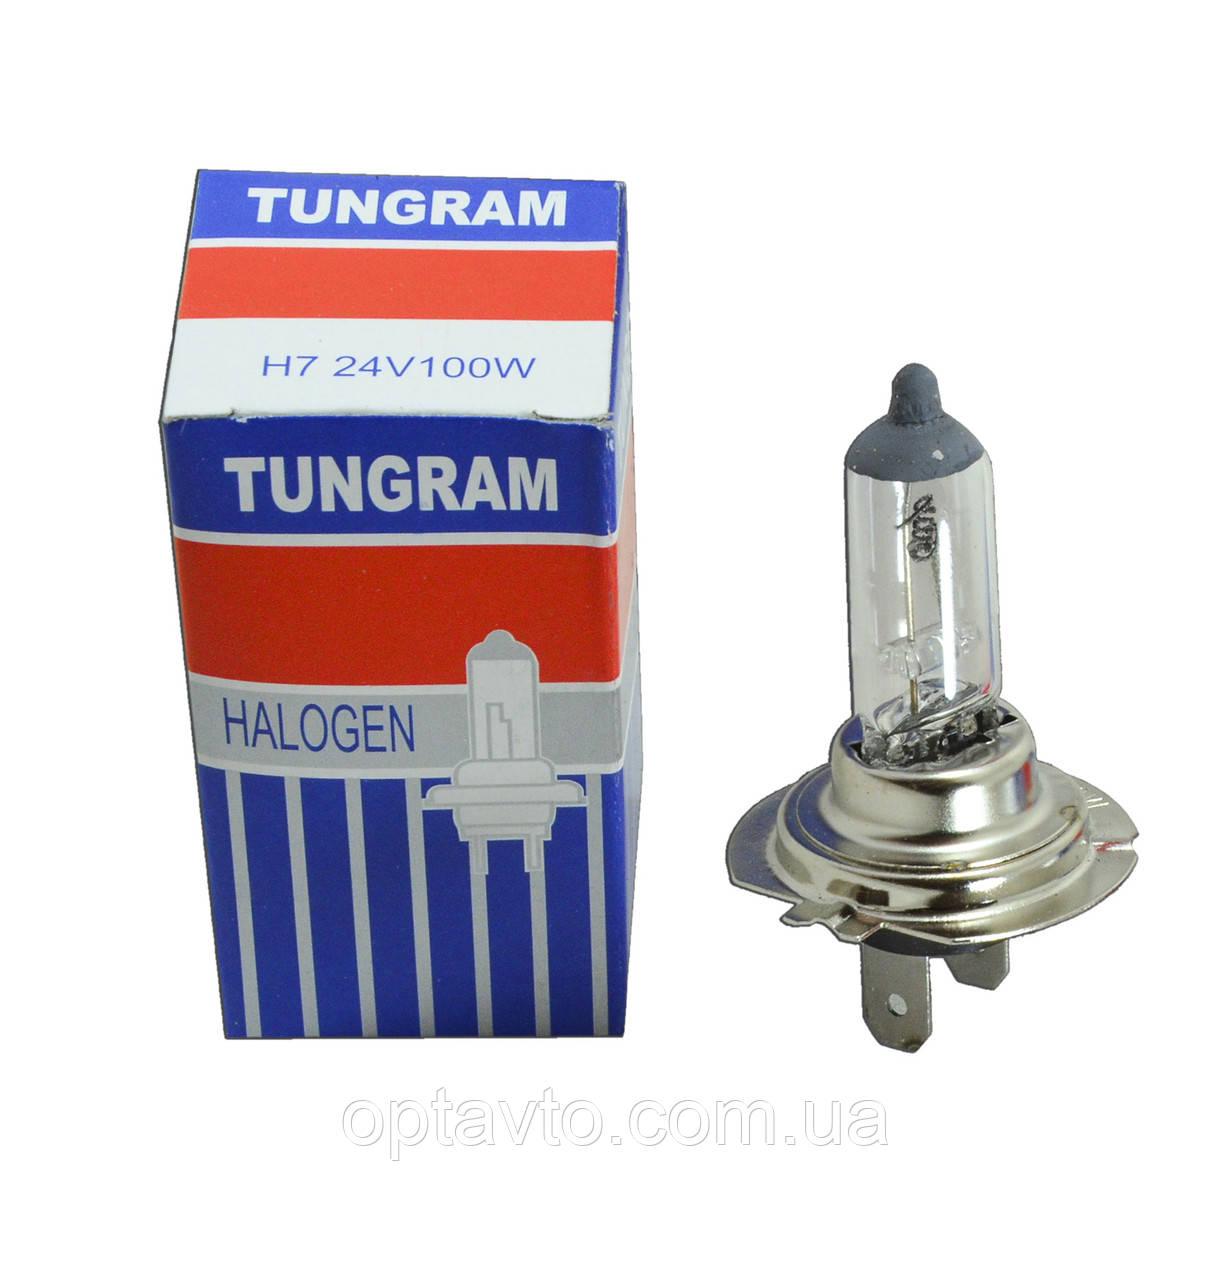 Грузовик H7 24V 100W Лампа TUNGRAM Strong Ligt